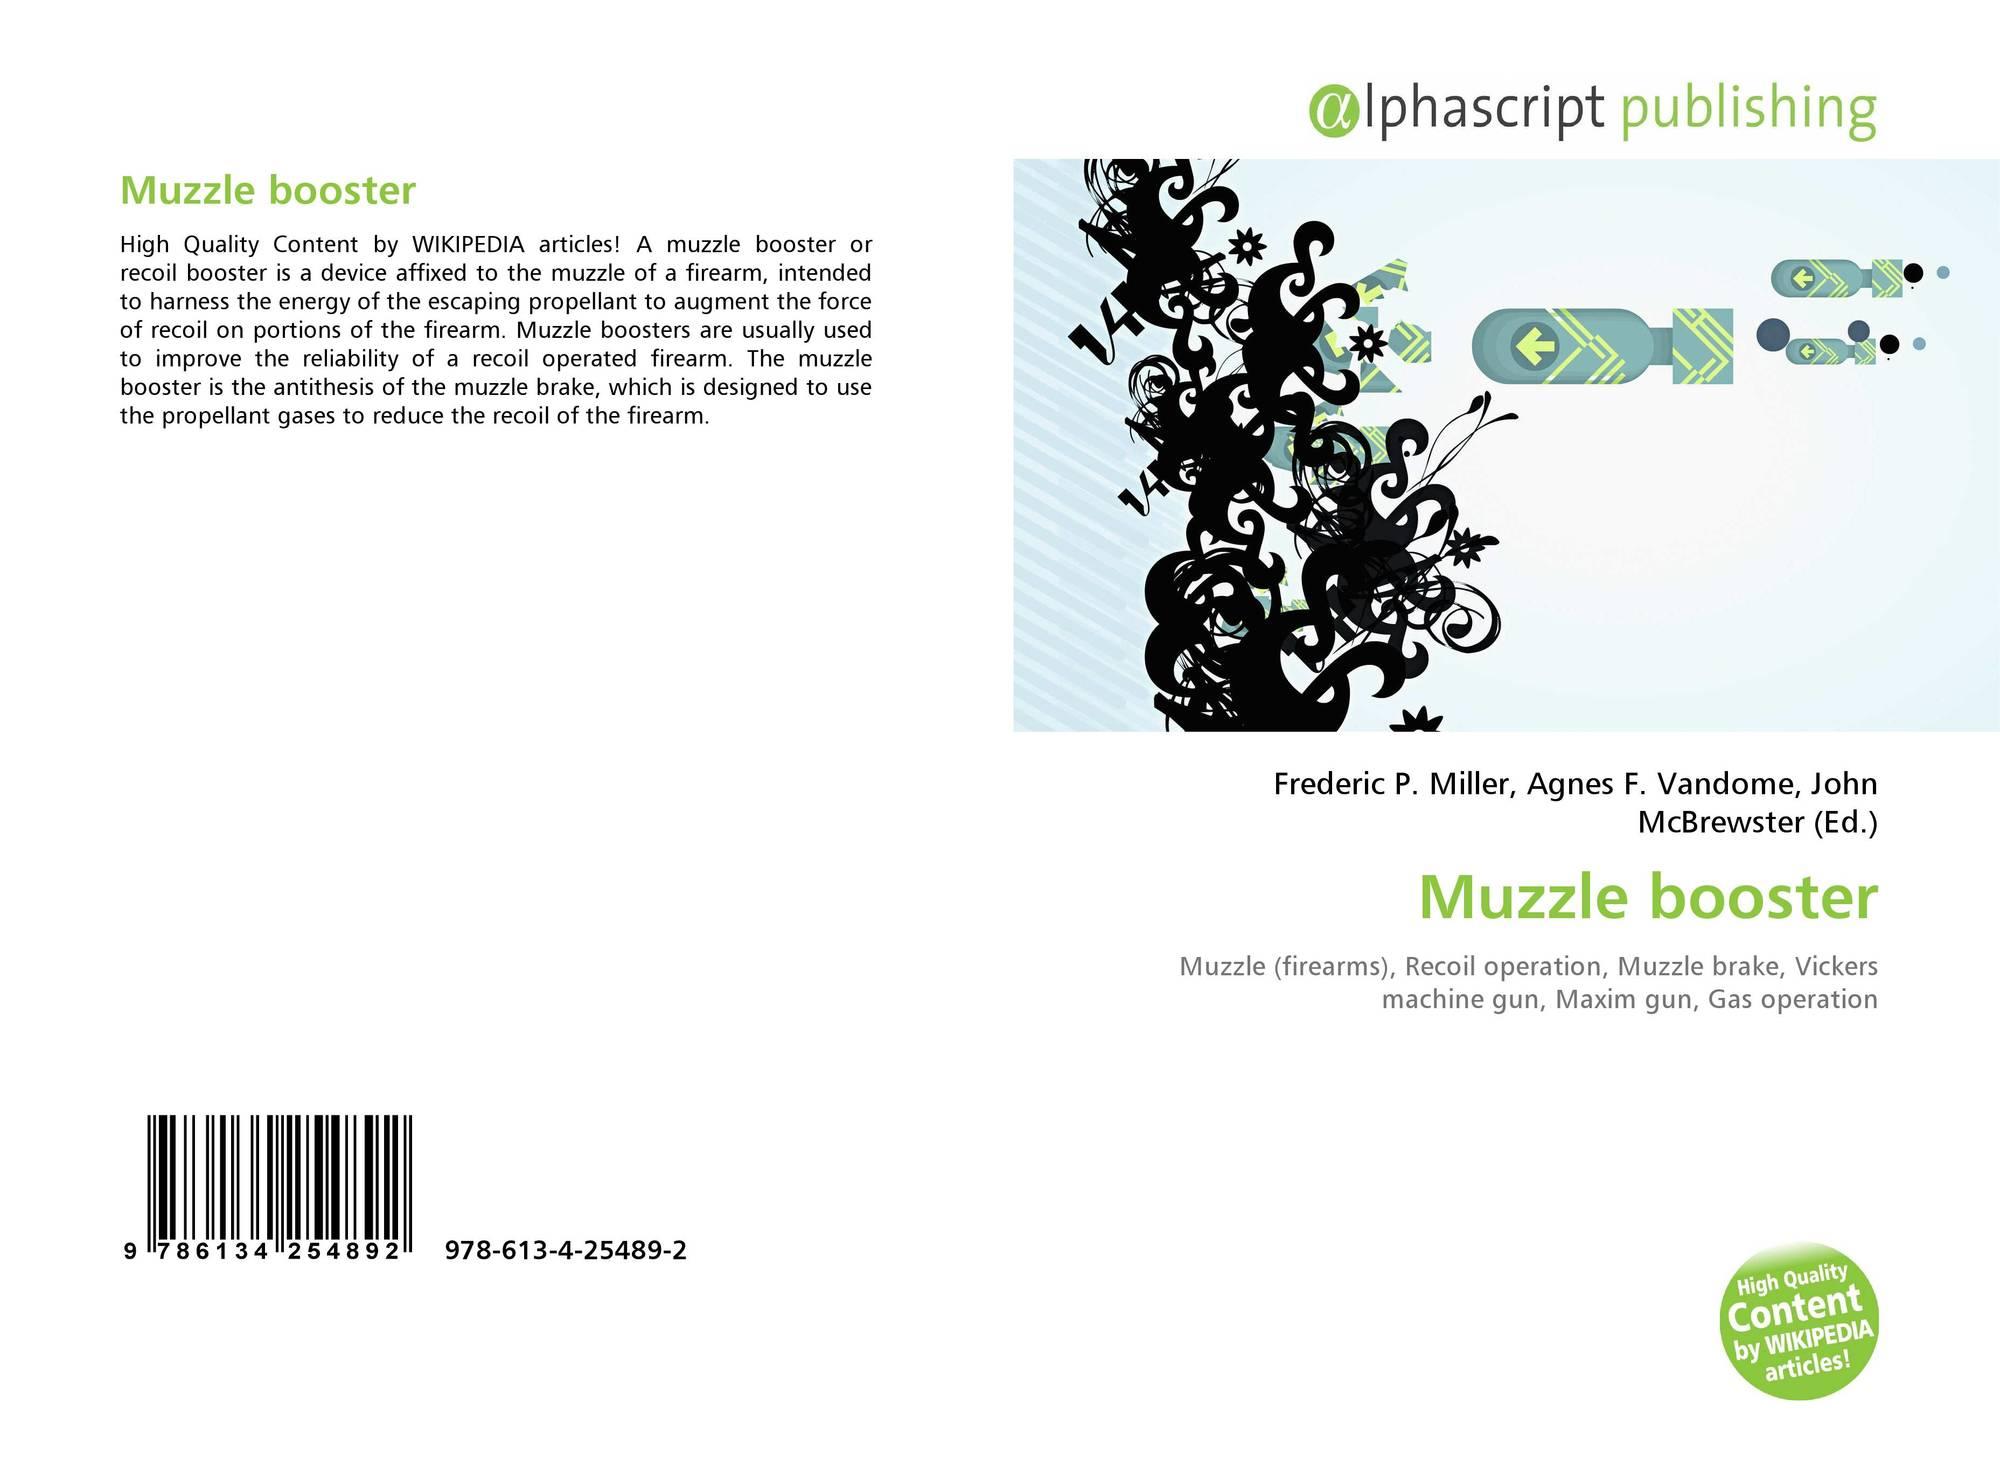 Muzzle Booster 978 613 4 25489 2 6134254894 9786134254892